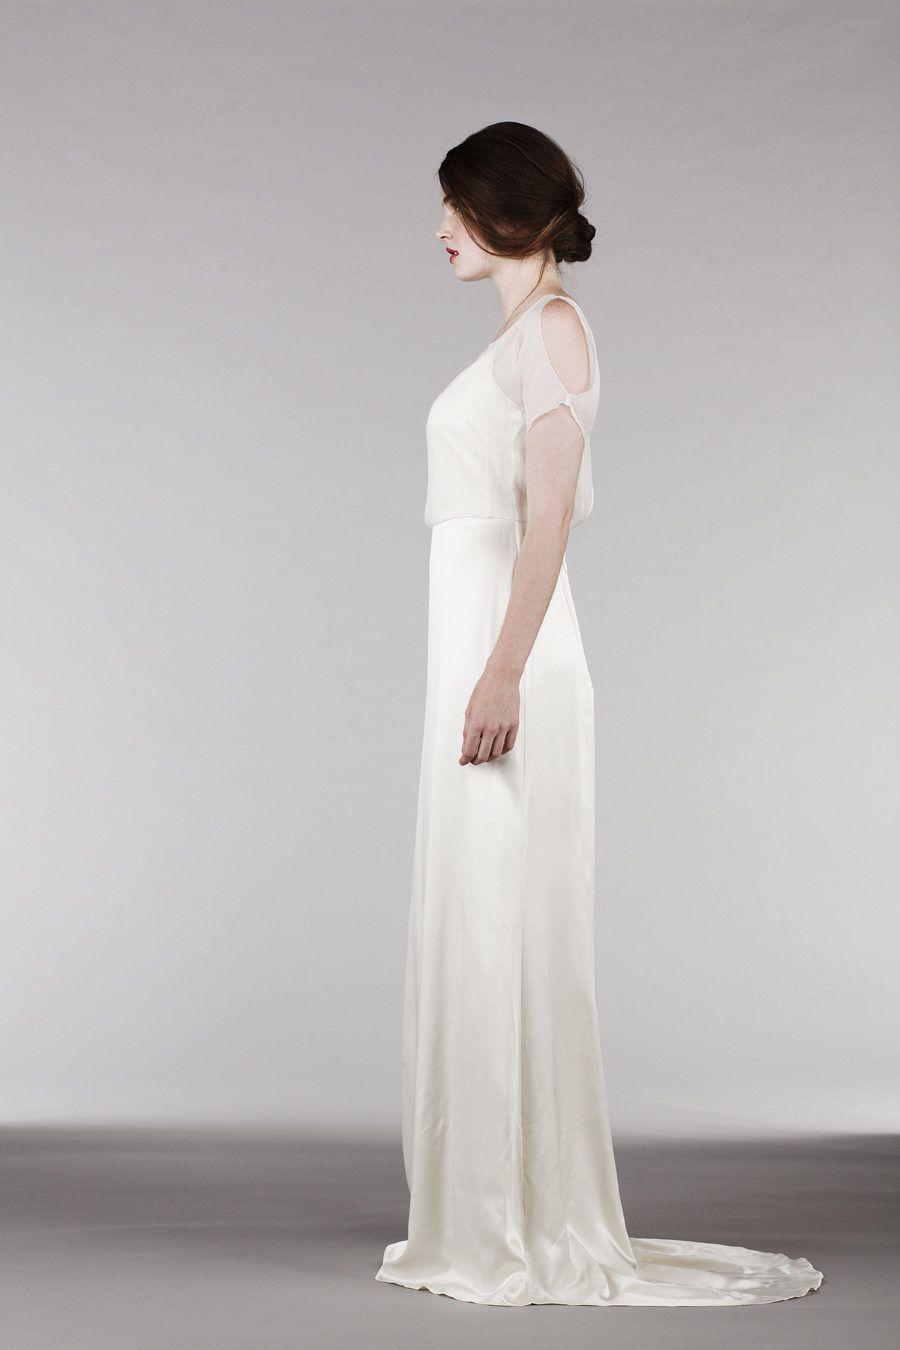 Saja Wedding 2015 Bridal Collection In 2020 Wedding Dresses Pretty Wedding Dresses Timeless Wedding Dress